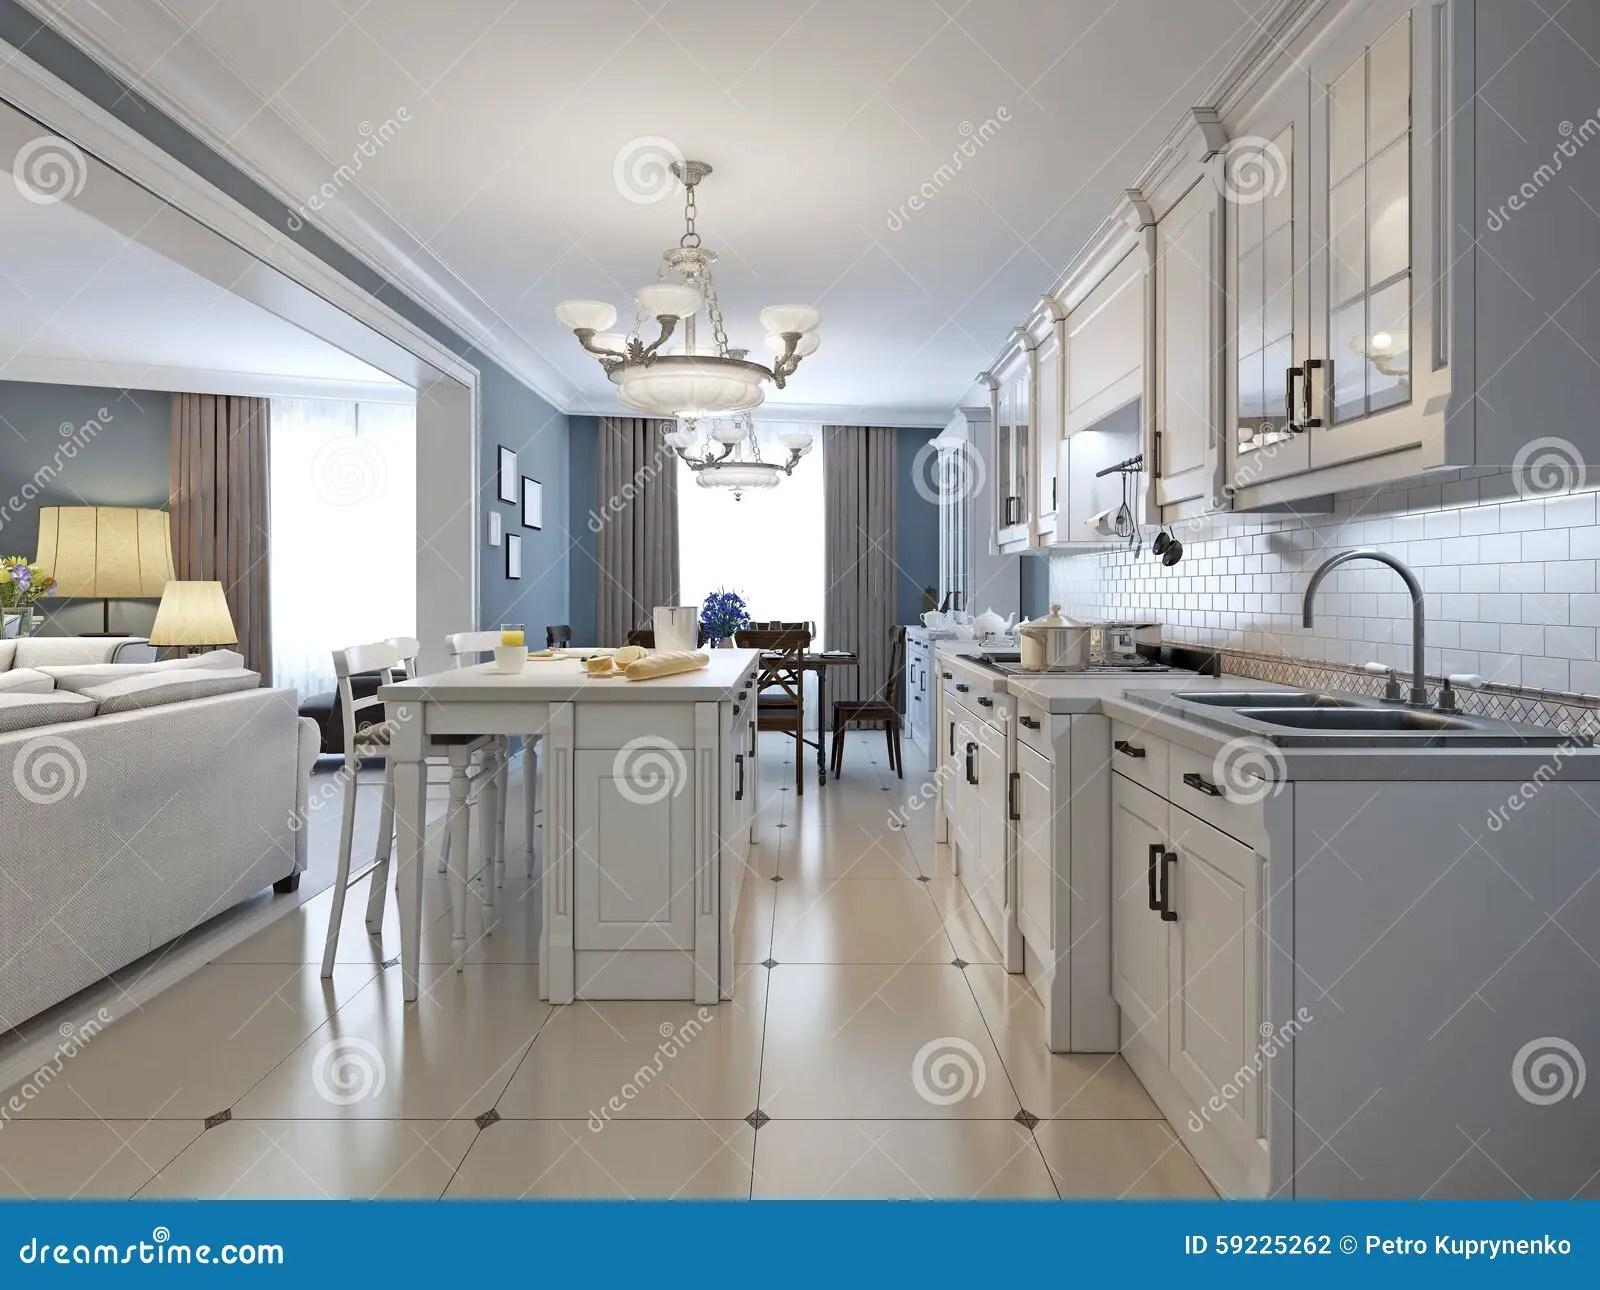 in stock kitchens solid wood shaker kitchen cabinets 厨房设计地中海样式的库存照片 图片包括有奶油 设计 光滑 颜色 赞誉 厨房设计地中海样式的